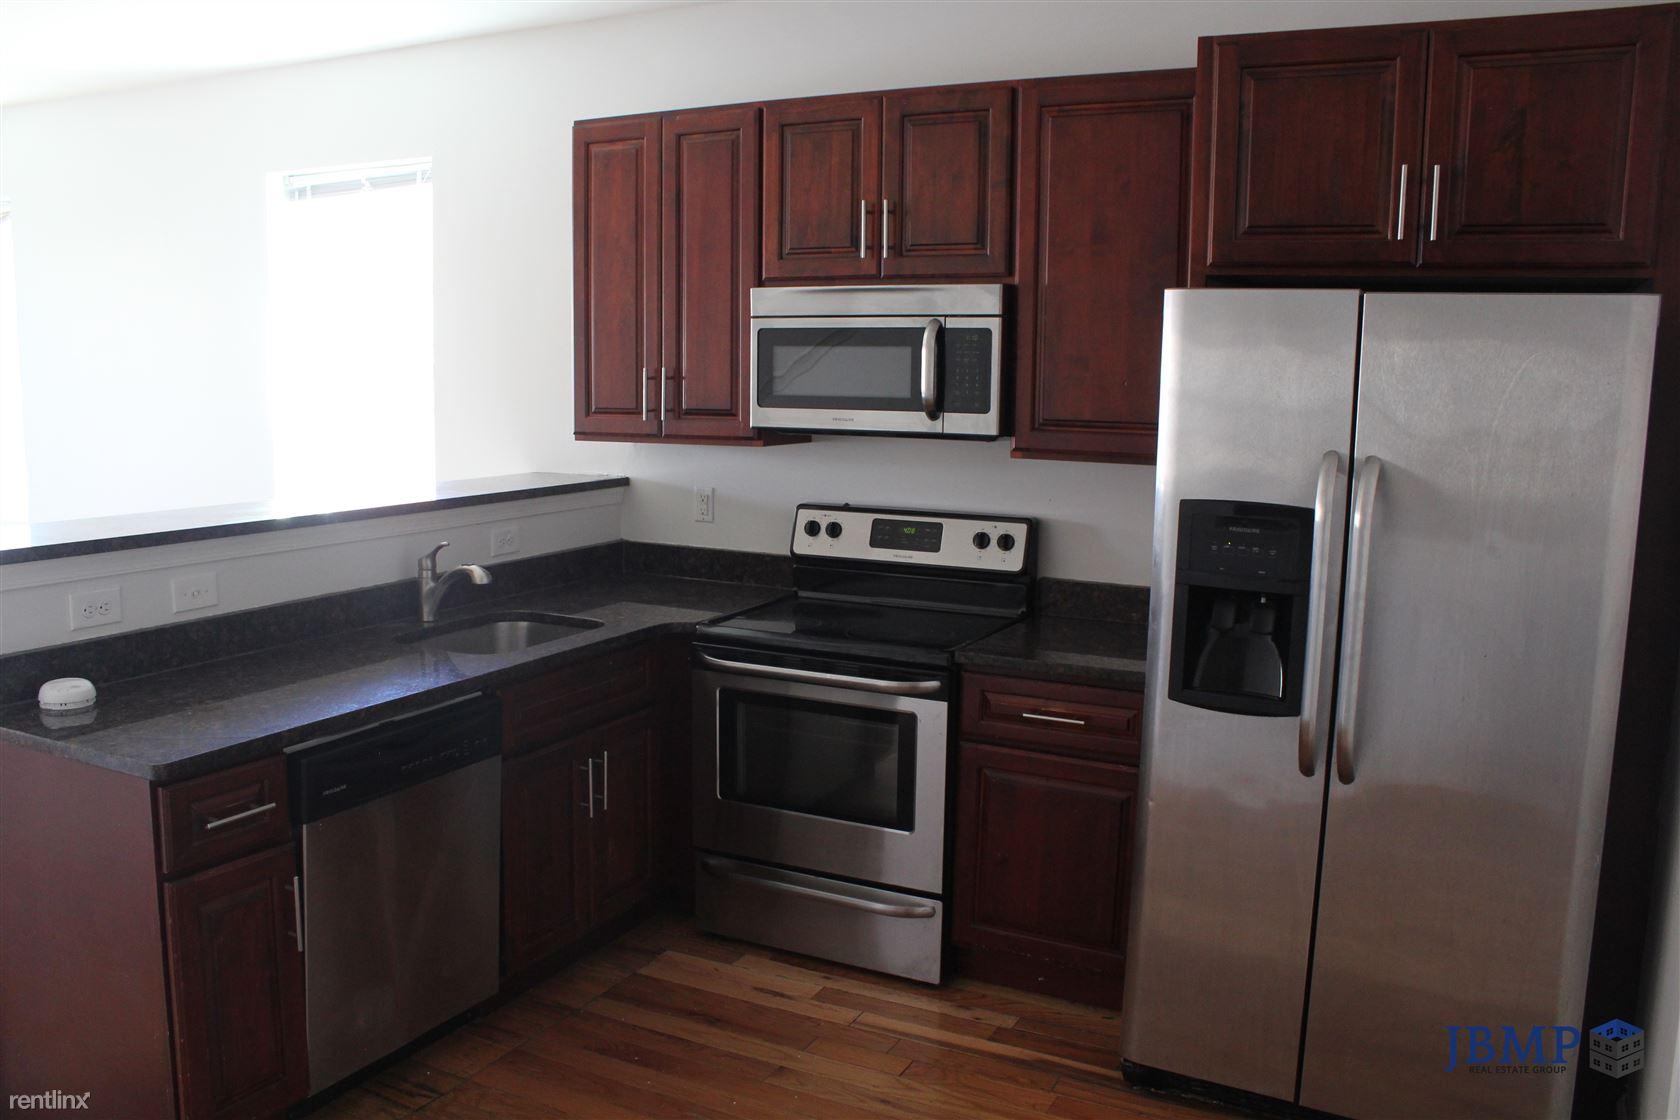 2106 N 17TH ST Unit 2, Philadelphia, PA - $2,820 USD/ month